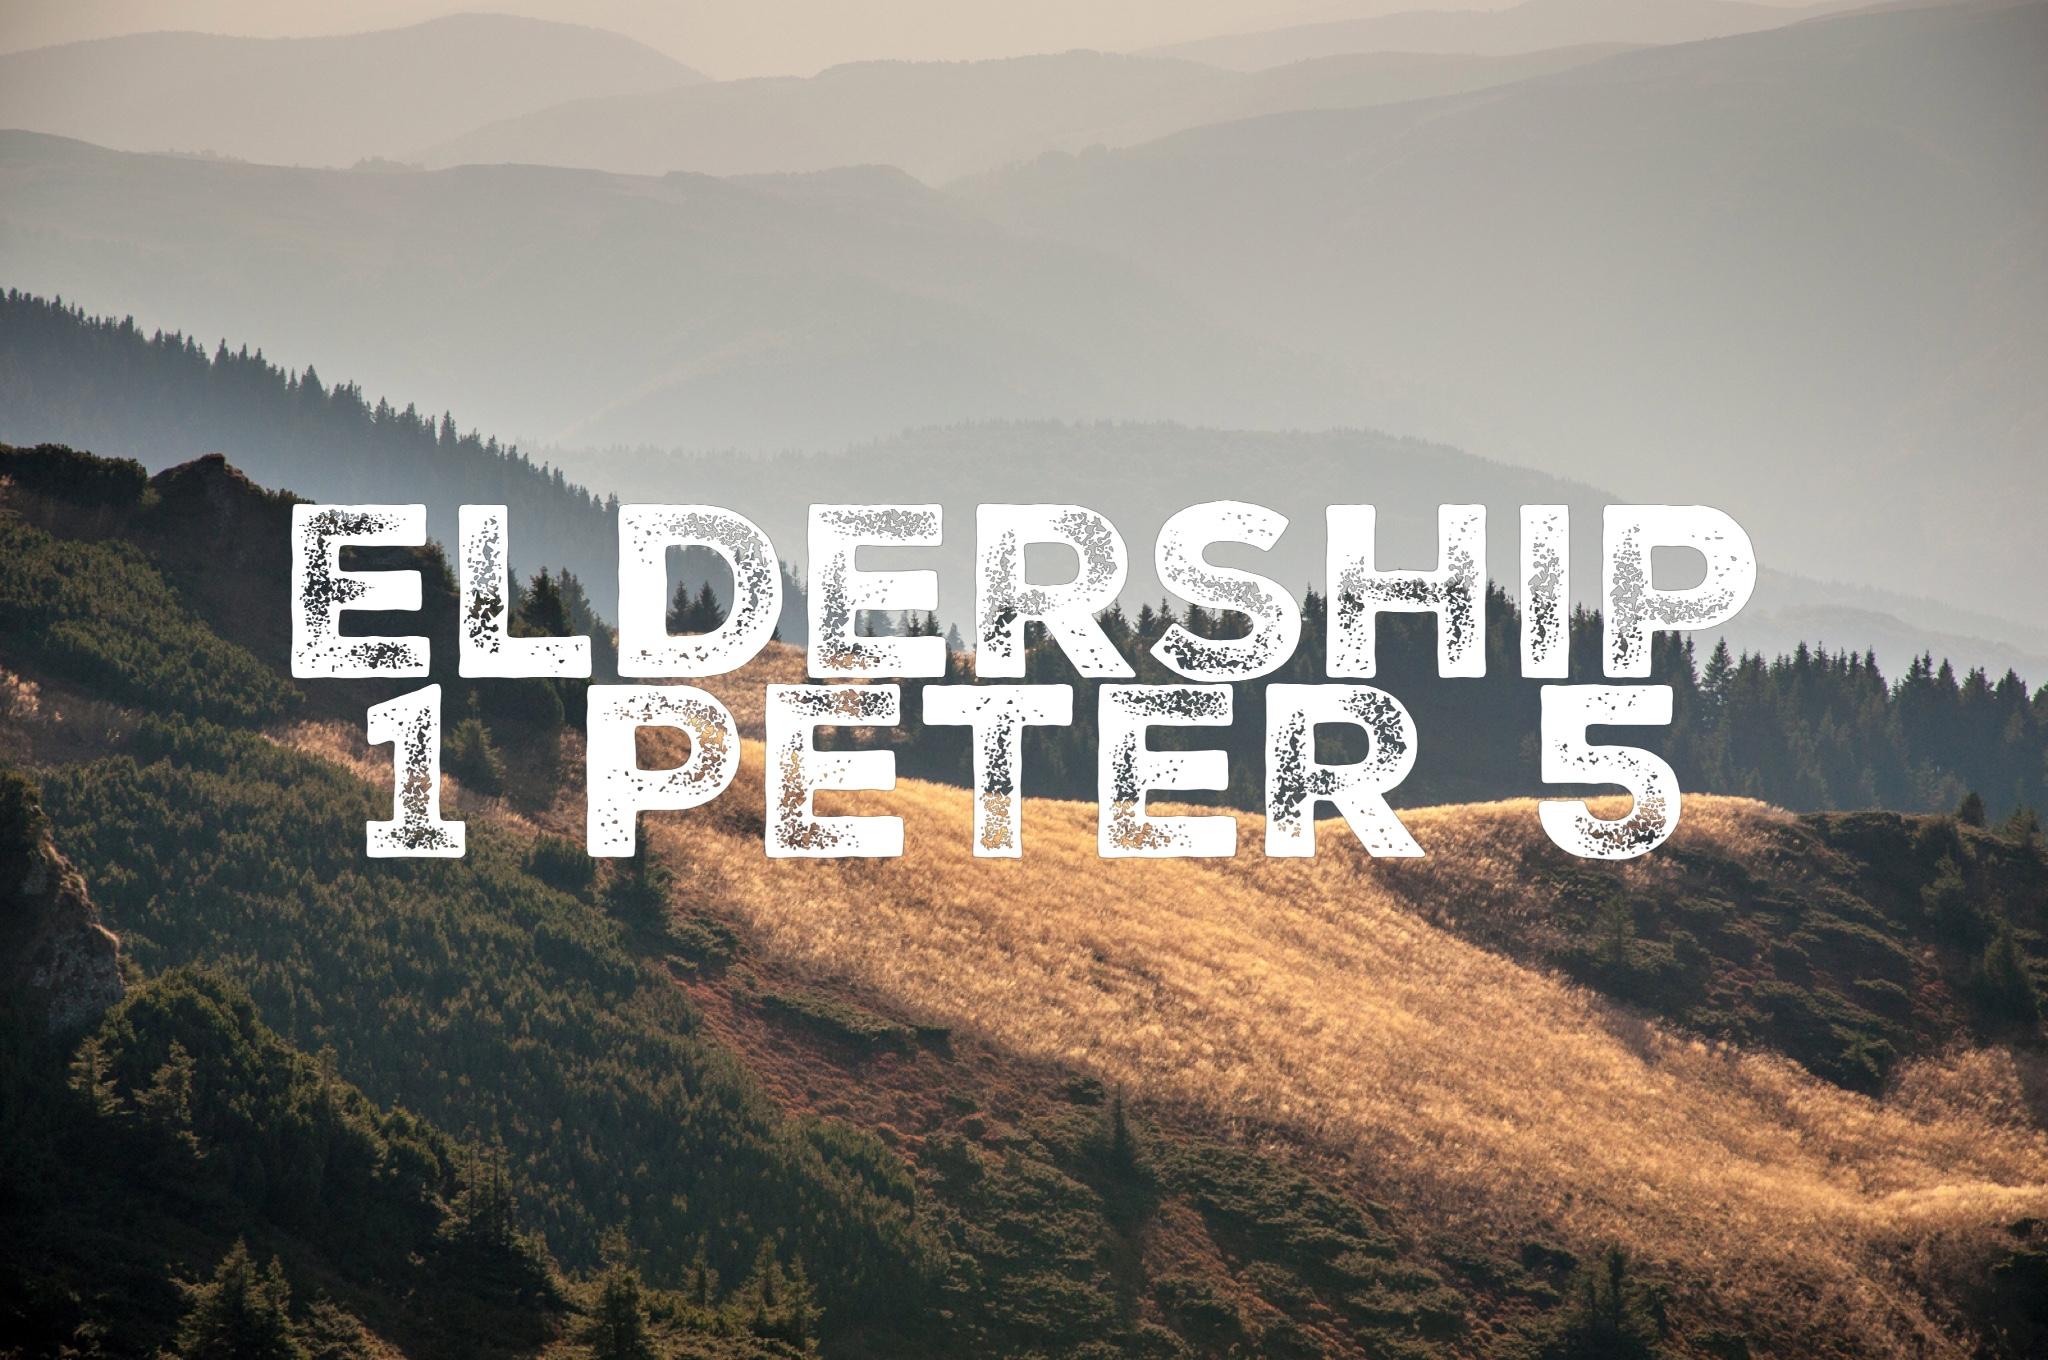 23/10/16  1 Peter 5